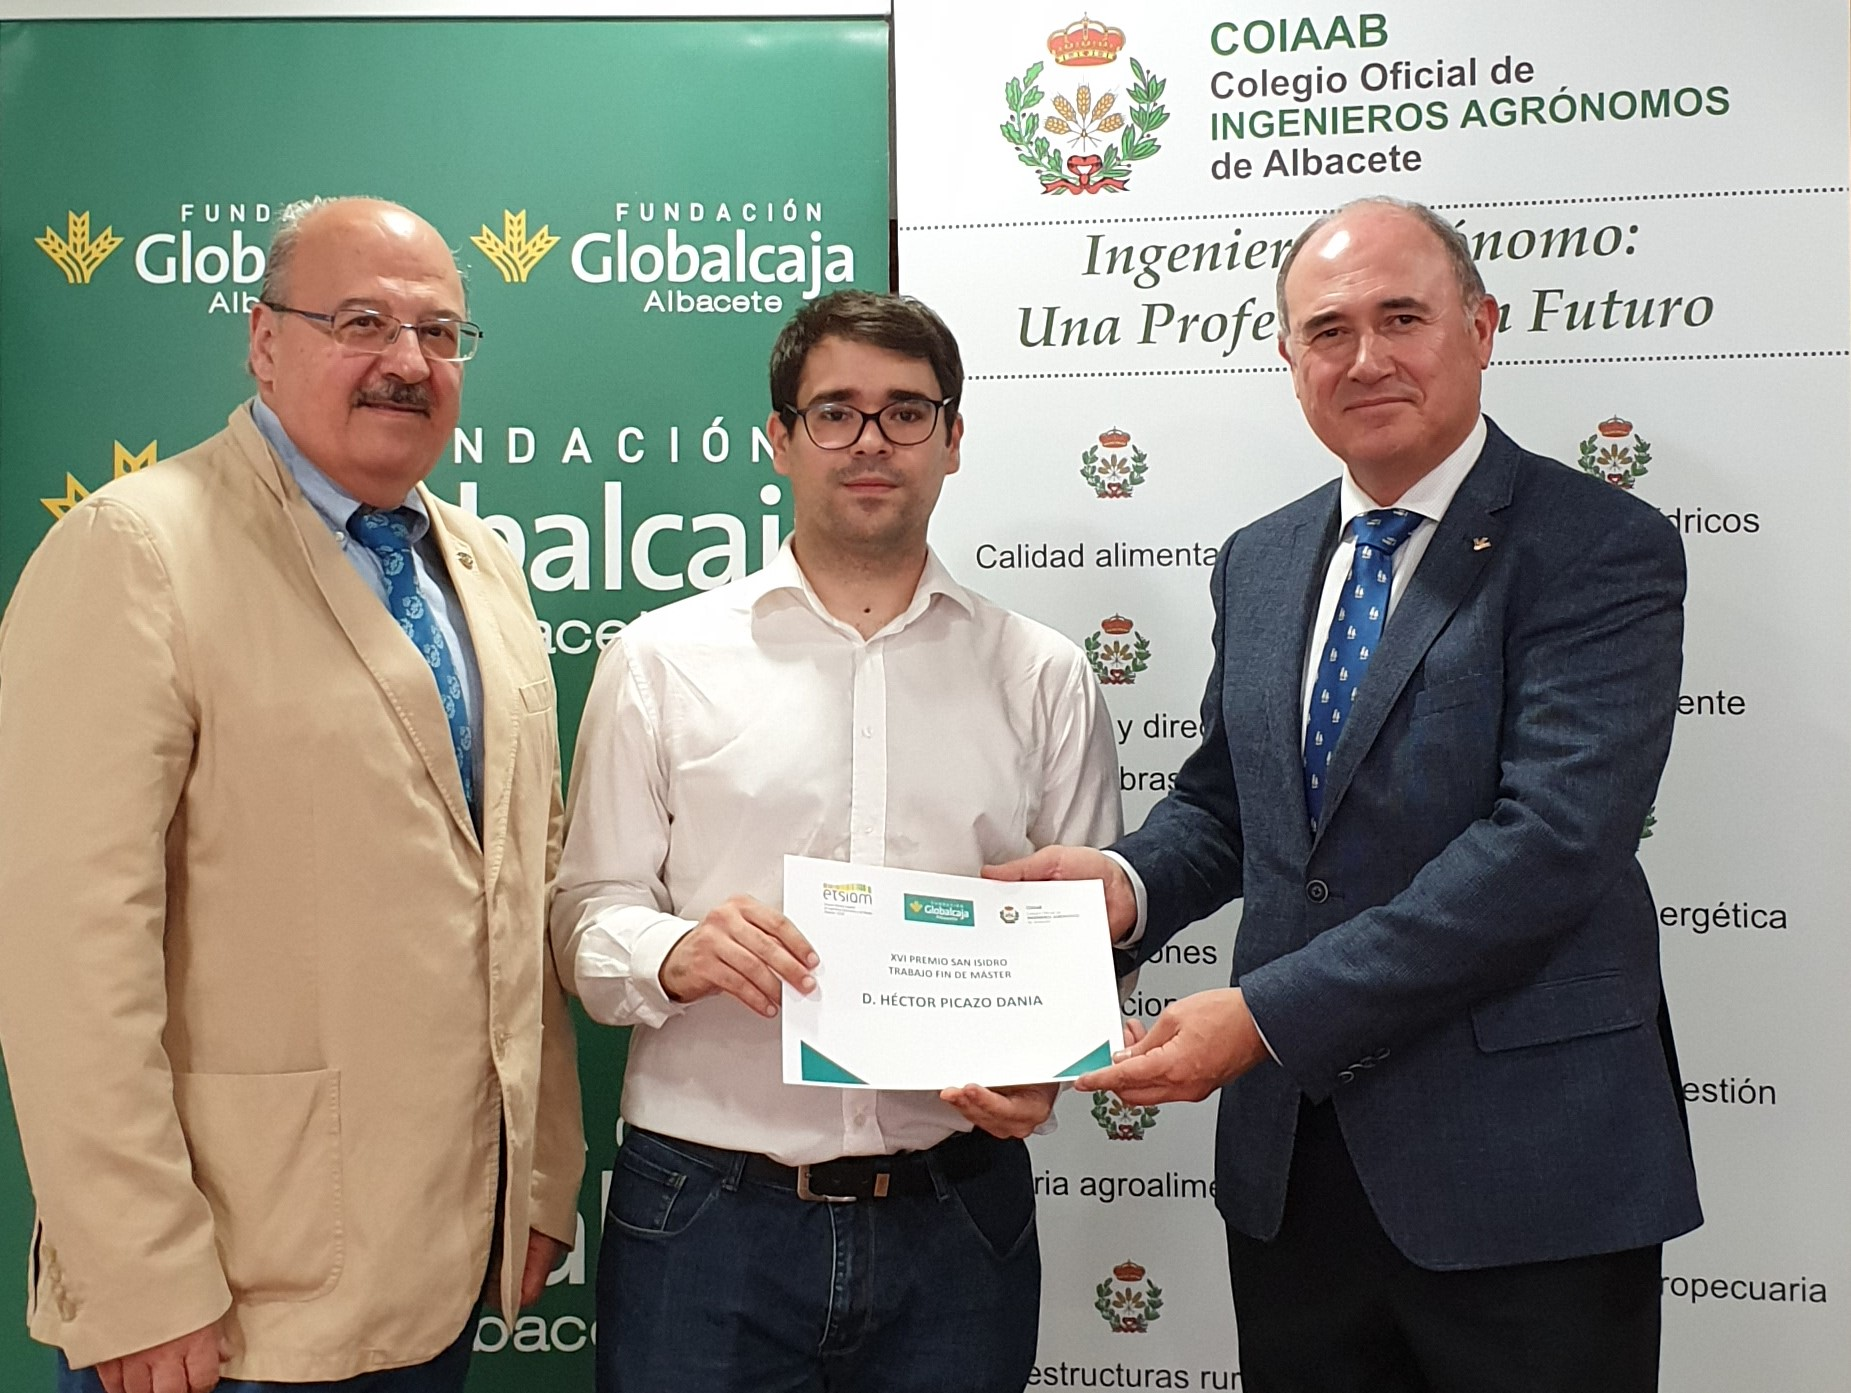 https://blog.globalcaja.es/wp-content/uploads/2019/06/Premio-San-Isidro.jpg